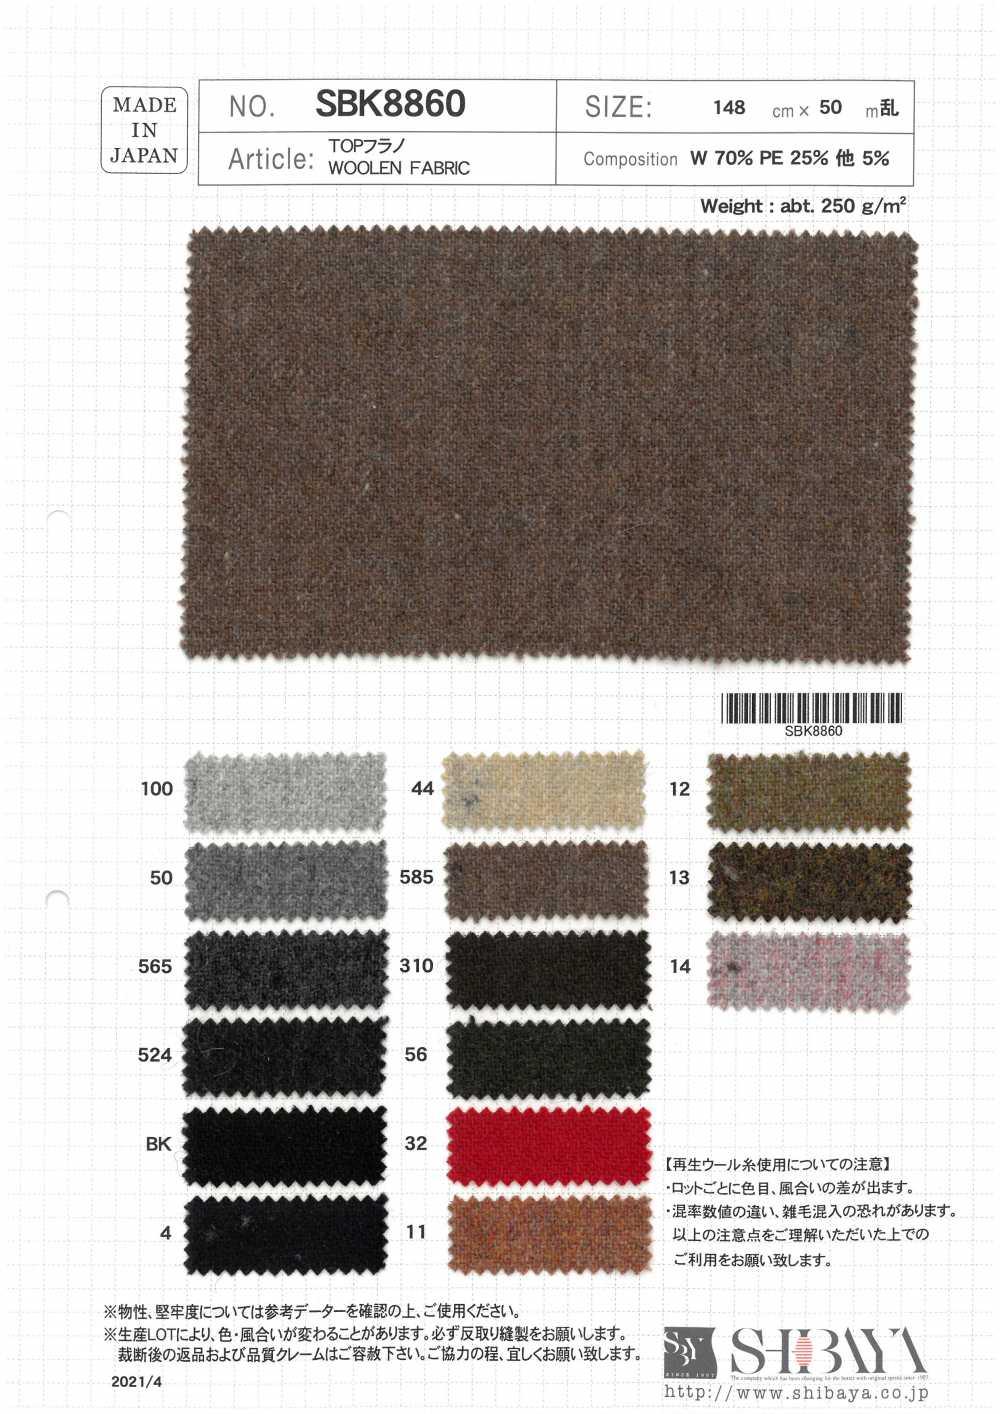 SBK8860 TOP フラノ[生地] 柴屋/オークラ商事 - ApparelX アパレル資材卸通販